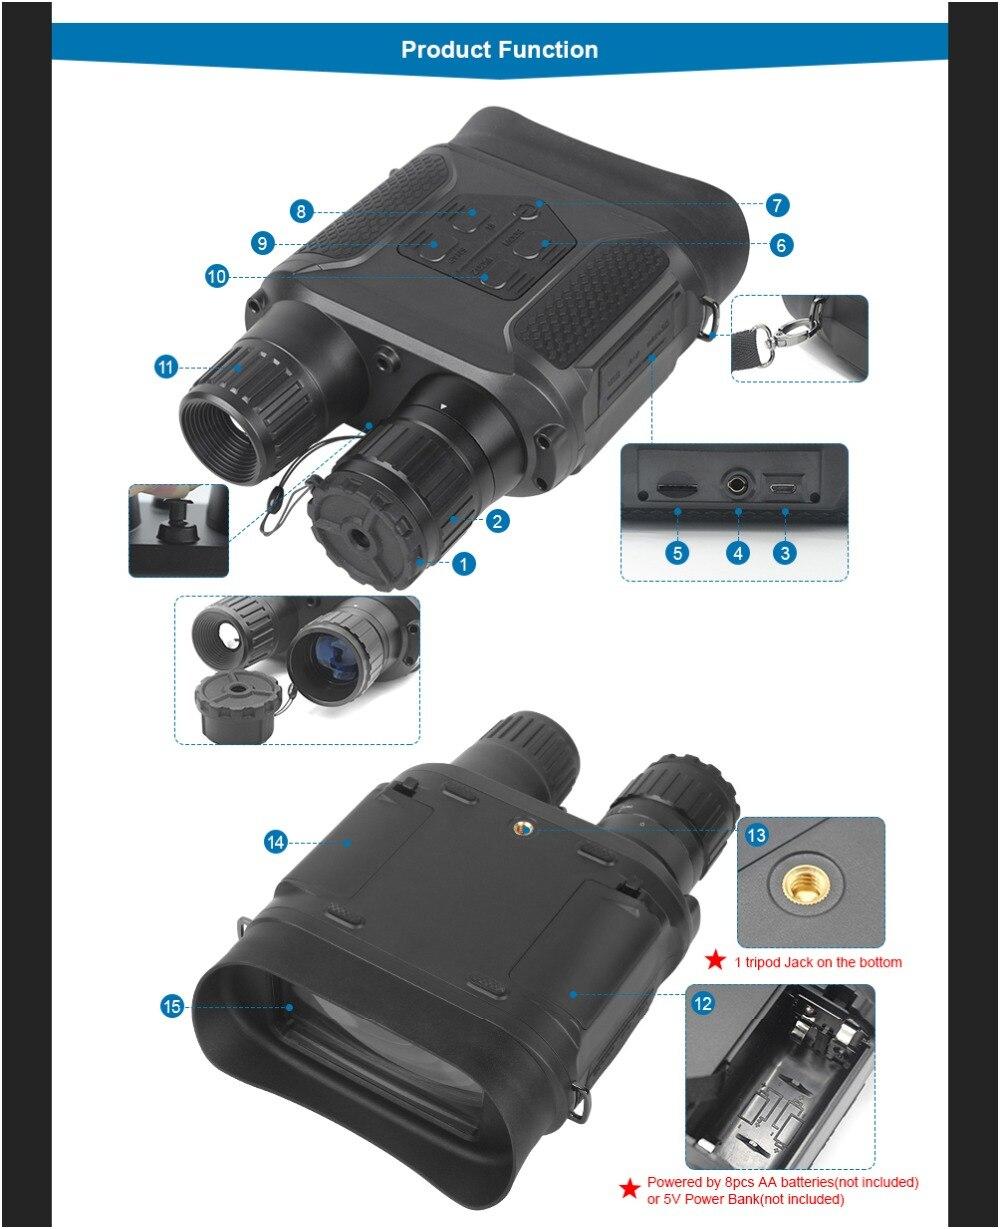 Seaocean quick head magic of hand monitor tripod camera video camera hot shoe removable